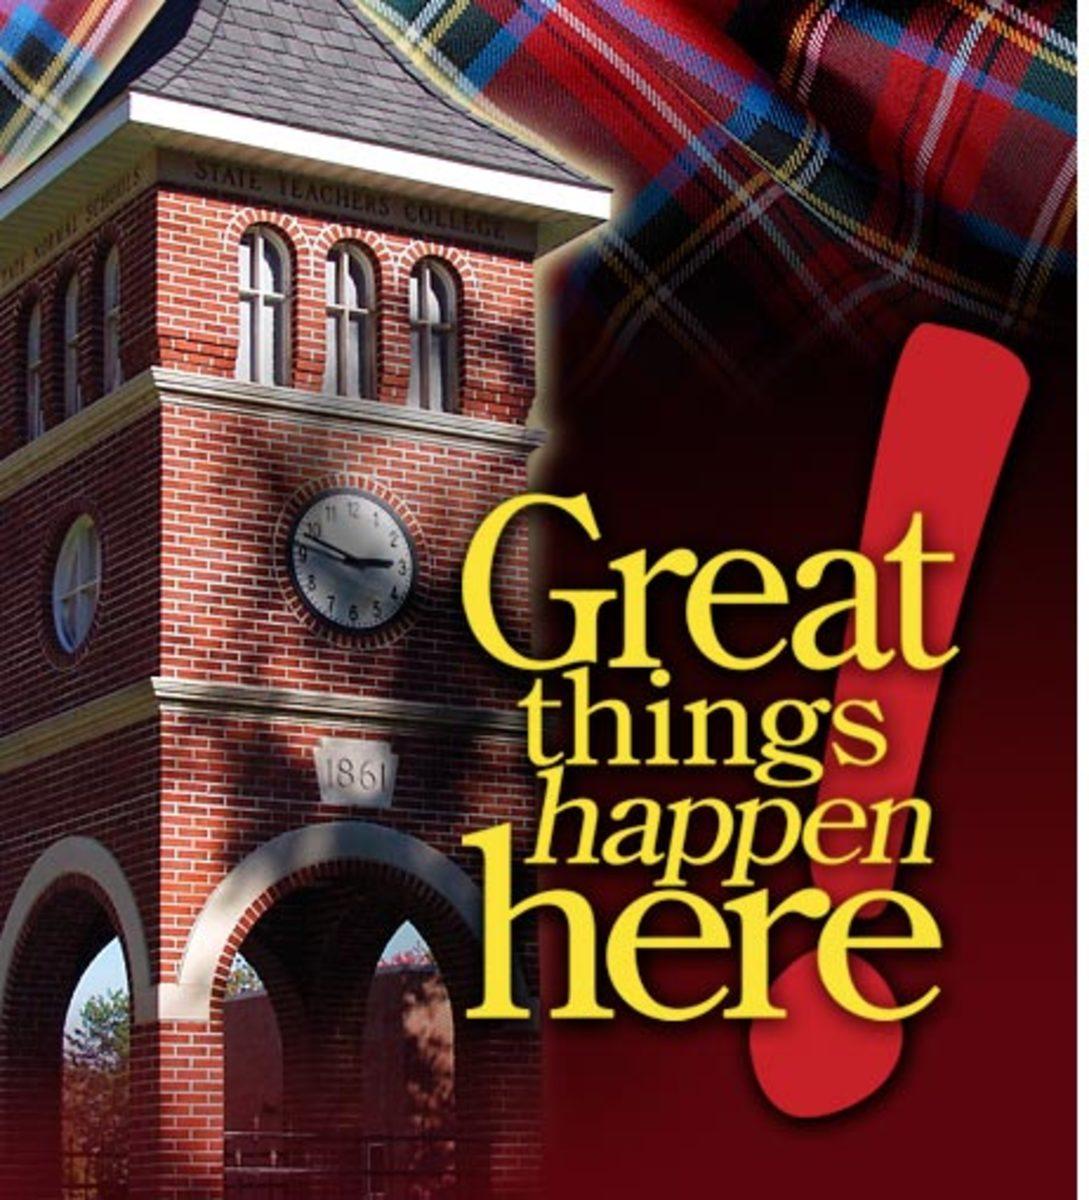 attending-edinboro-university-tips-fun-facts-and-fair-warnings